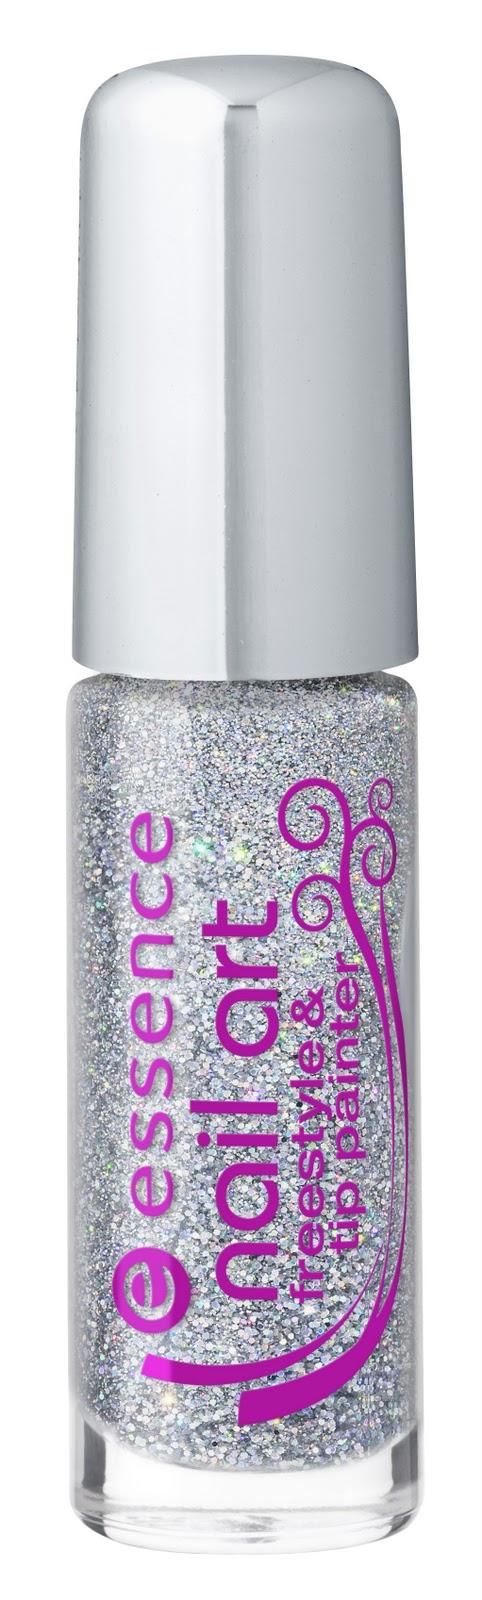 Essence Nail Art Stampy Polish Matte Creative Touch